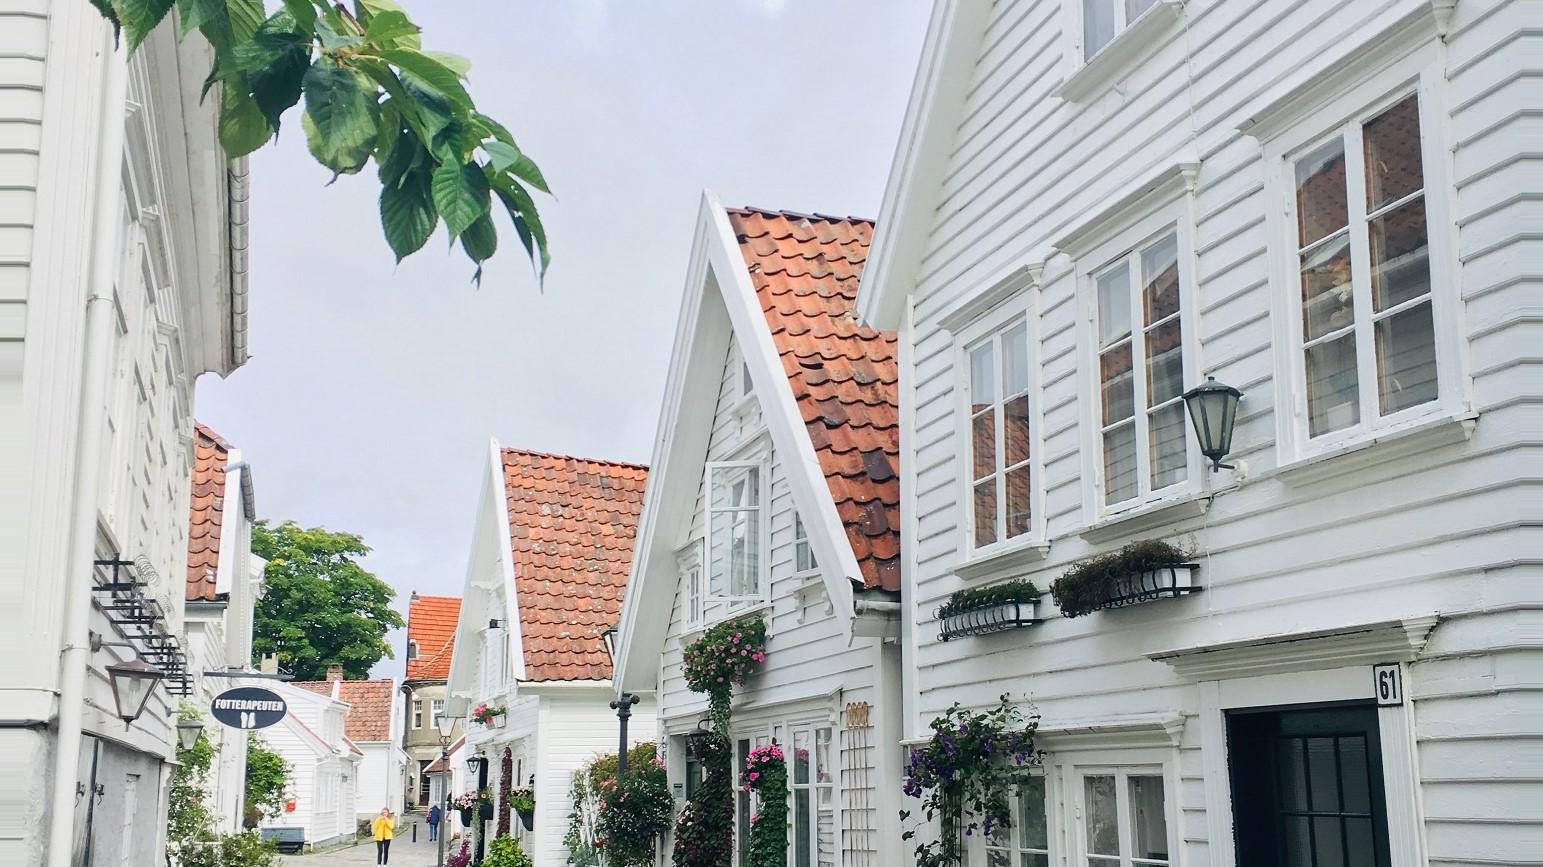 Stavanger óváros - Gamle Stavanger